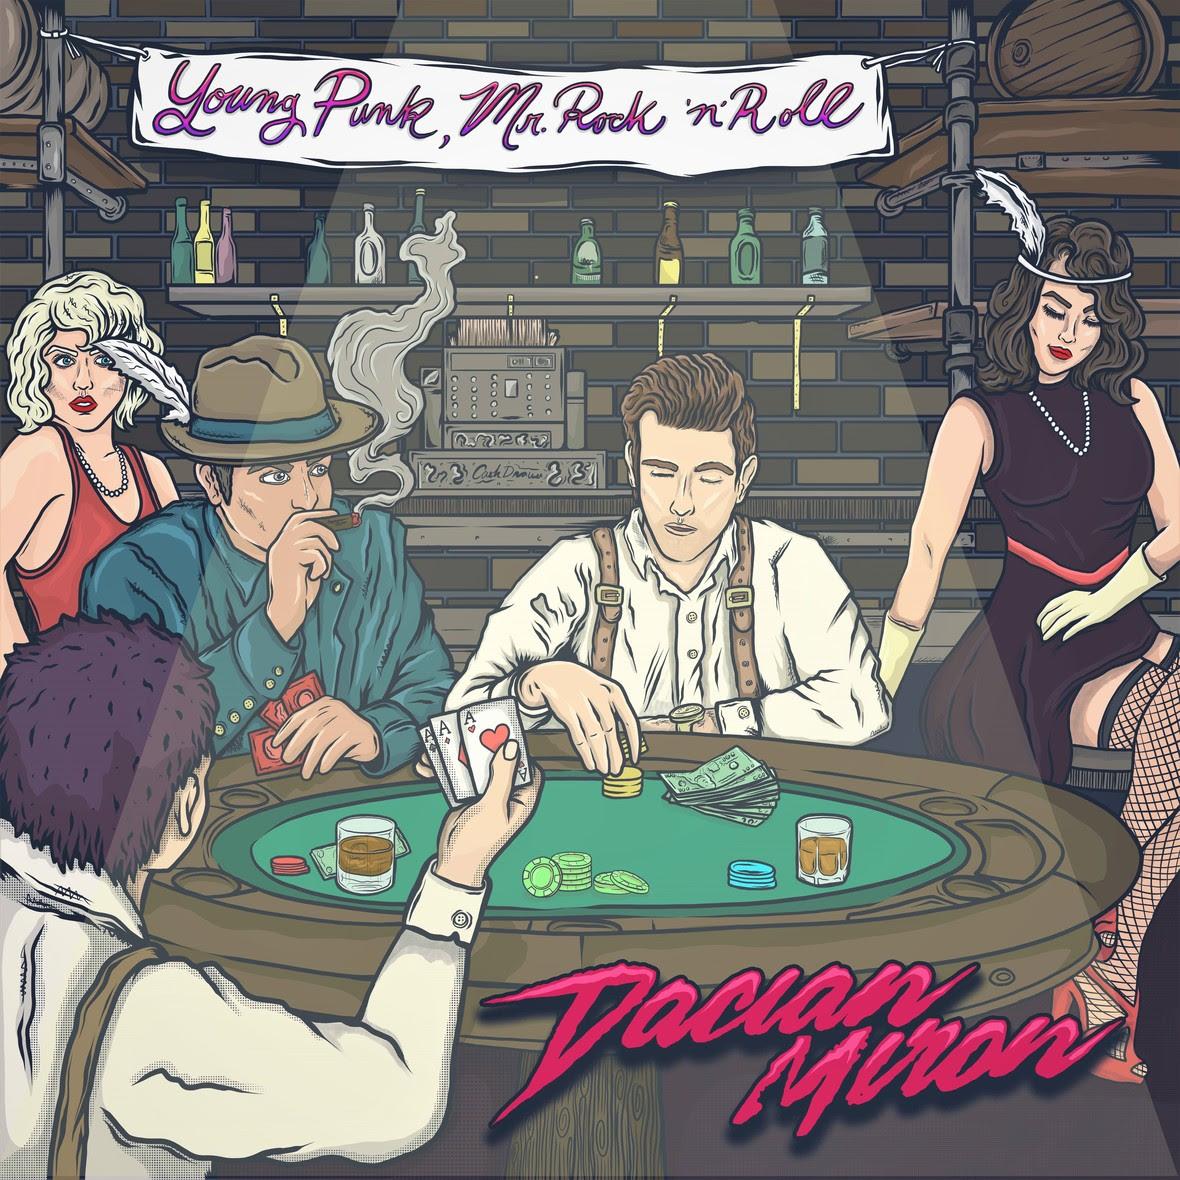 Dacian-Young-Punk-Mr-Rock-n-Roll-High-Res Final